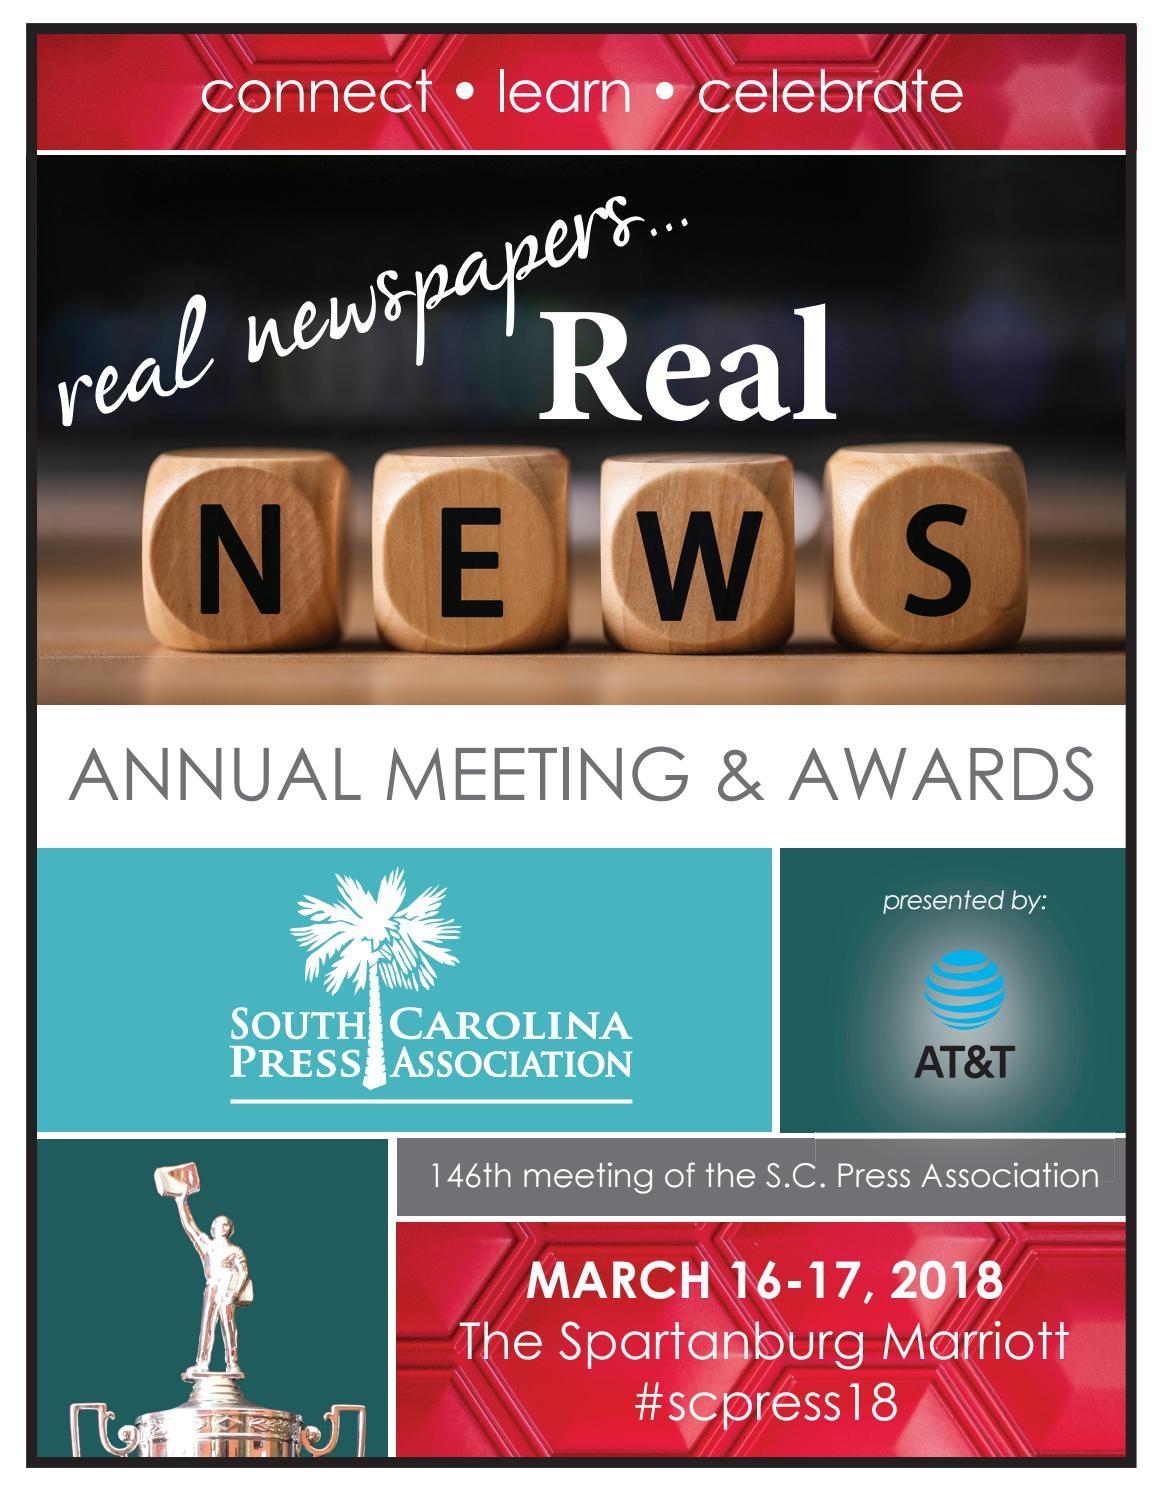 2018 Annual Meeting Awards Program by S.C. Press Association - issuu